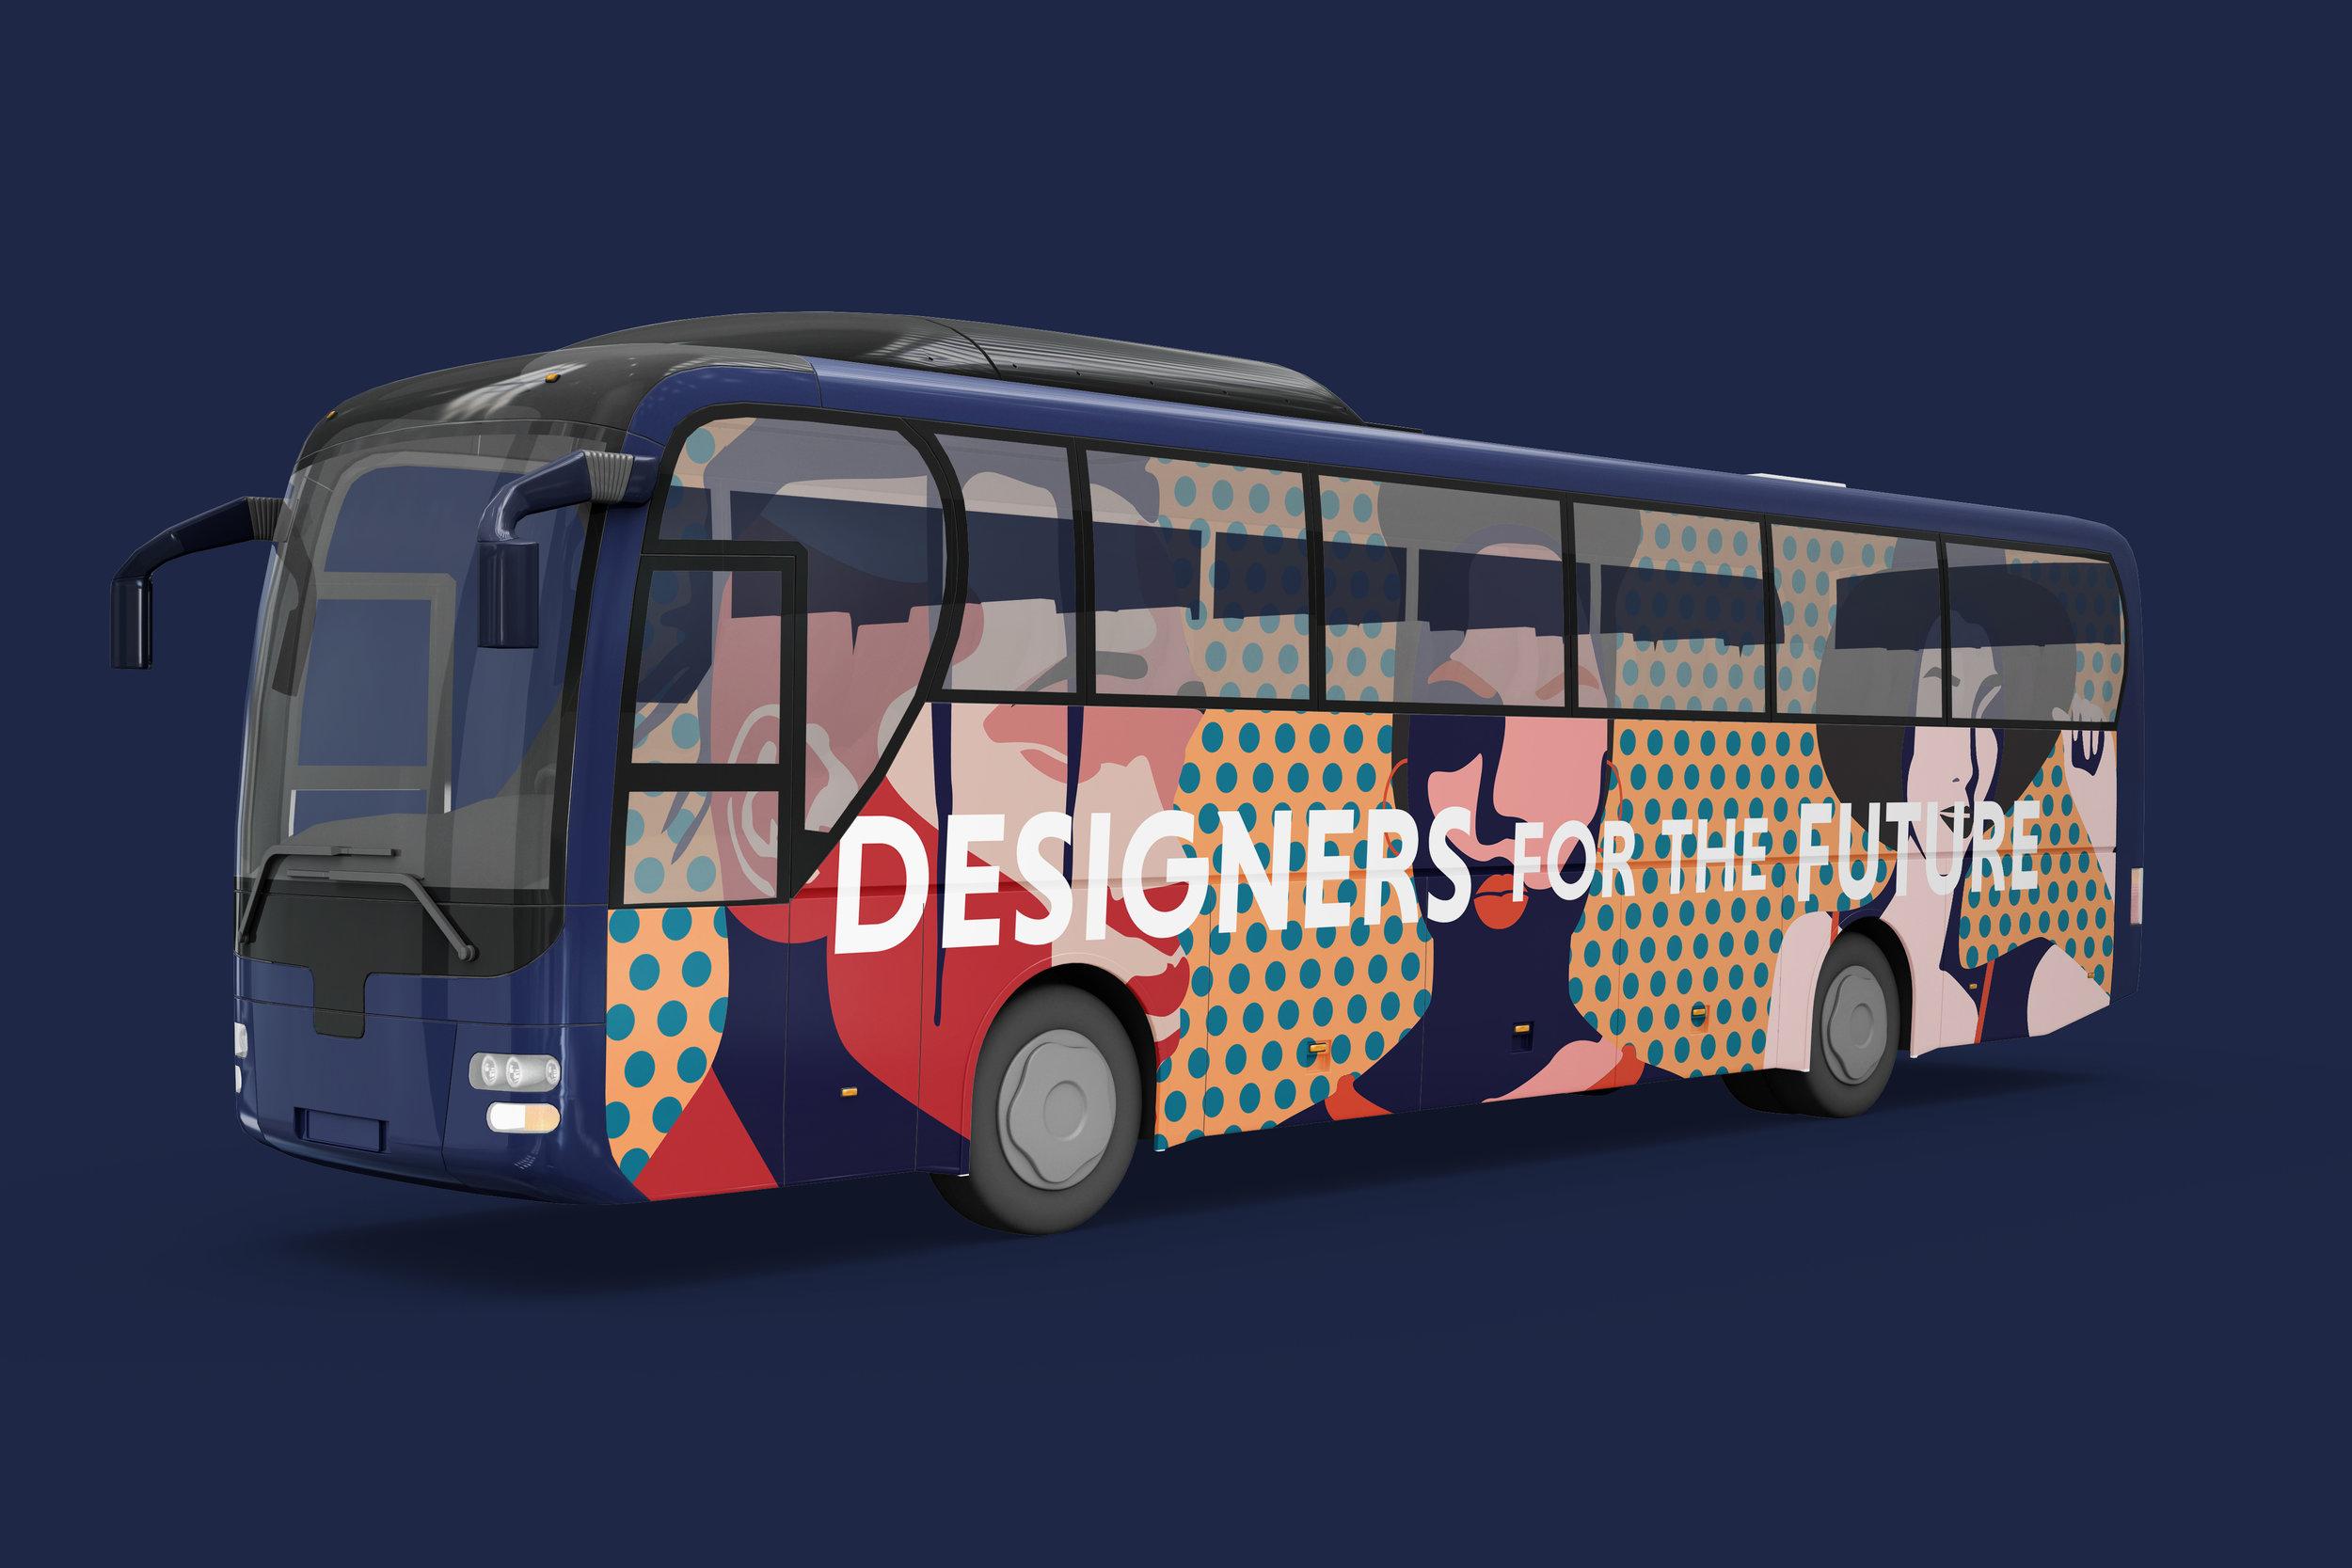 Designersforthefuture-bus.jpg